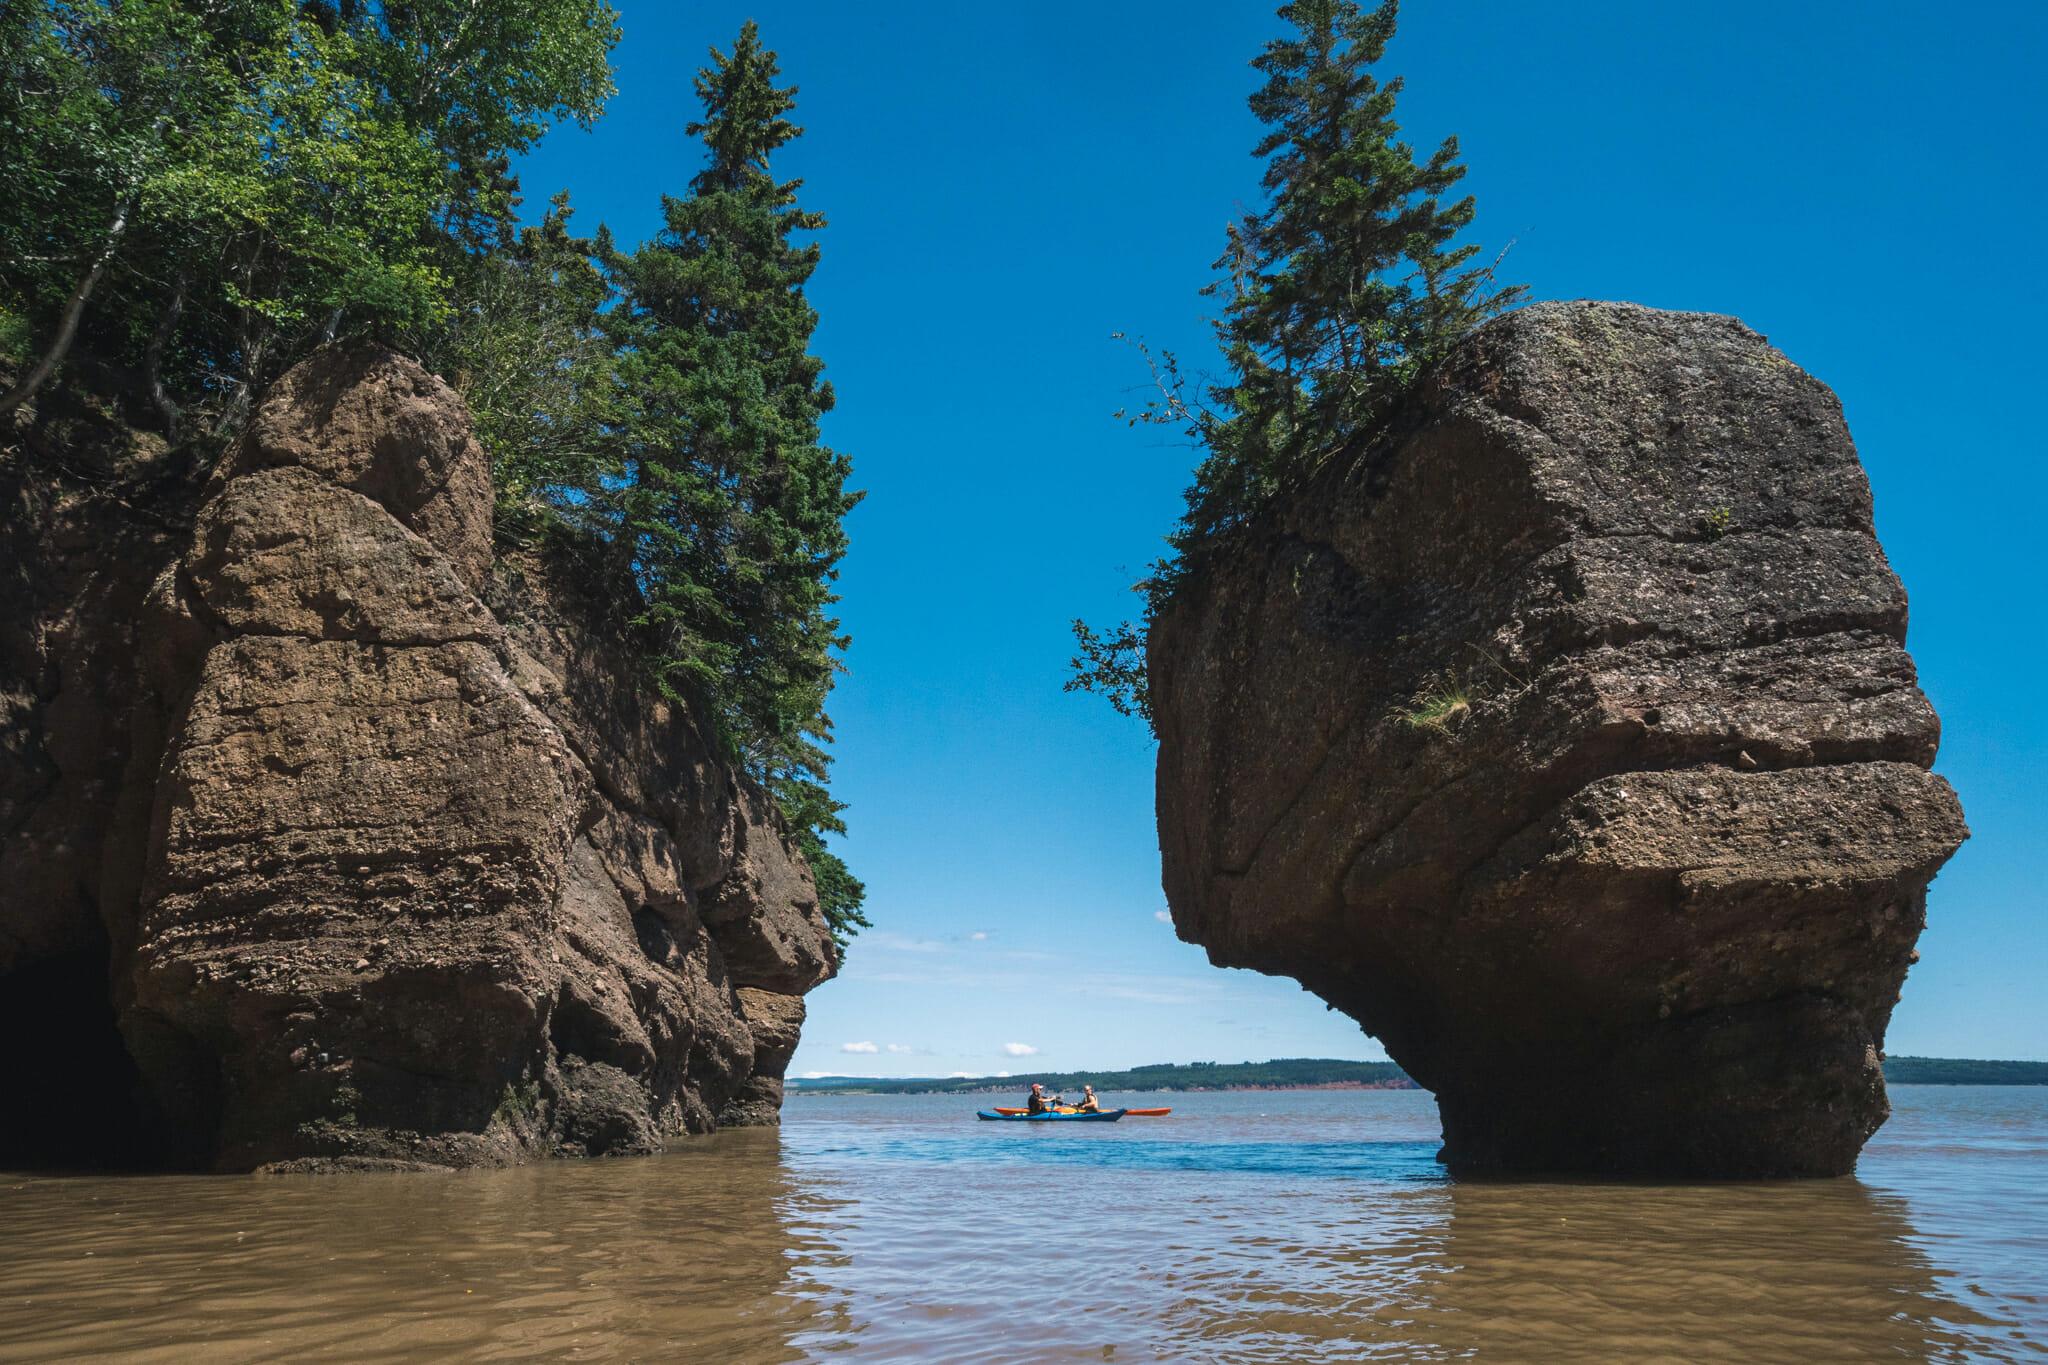 hopewell rocks-que-faire-canada